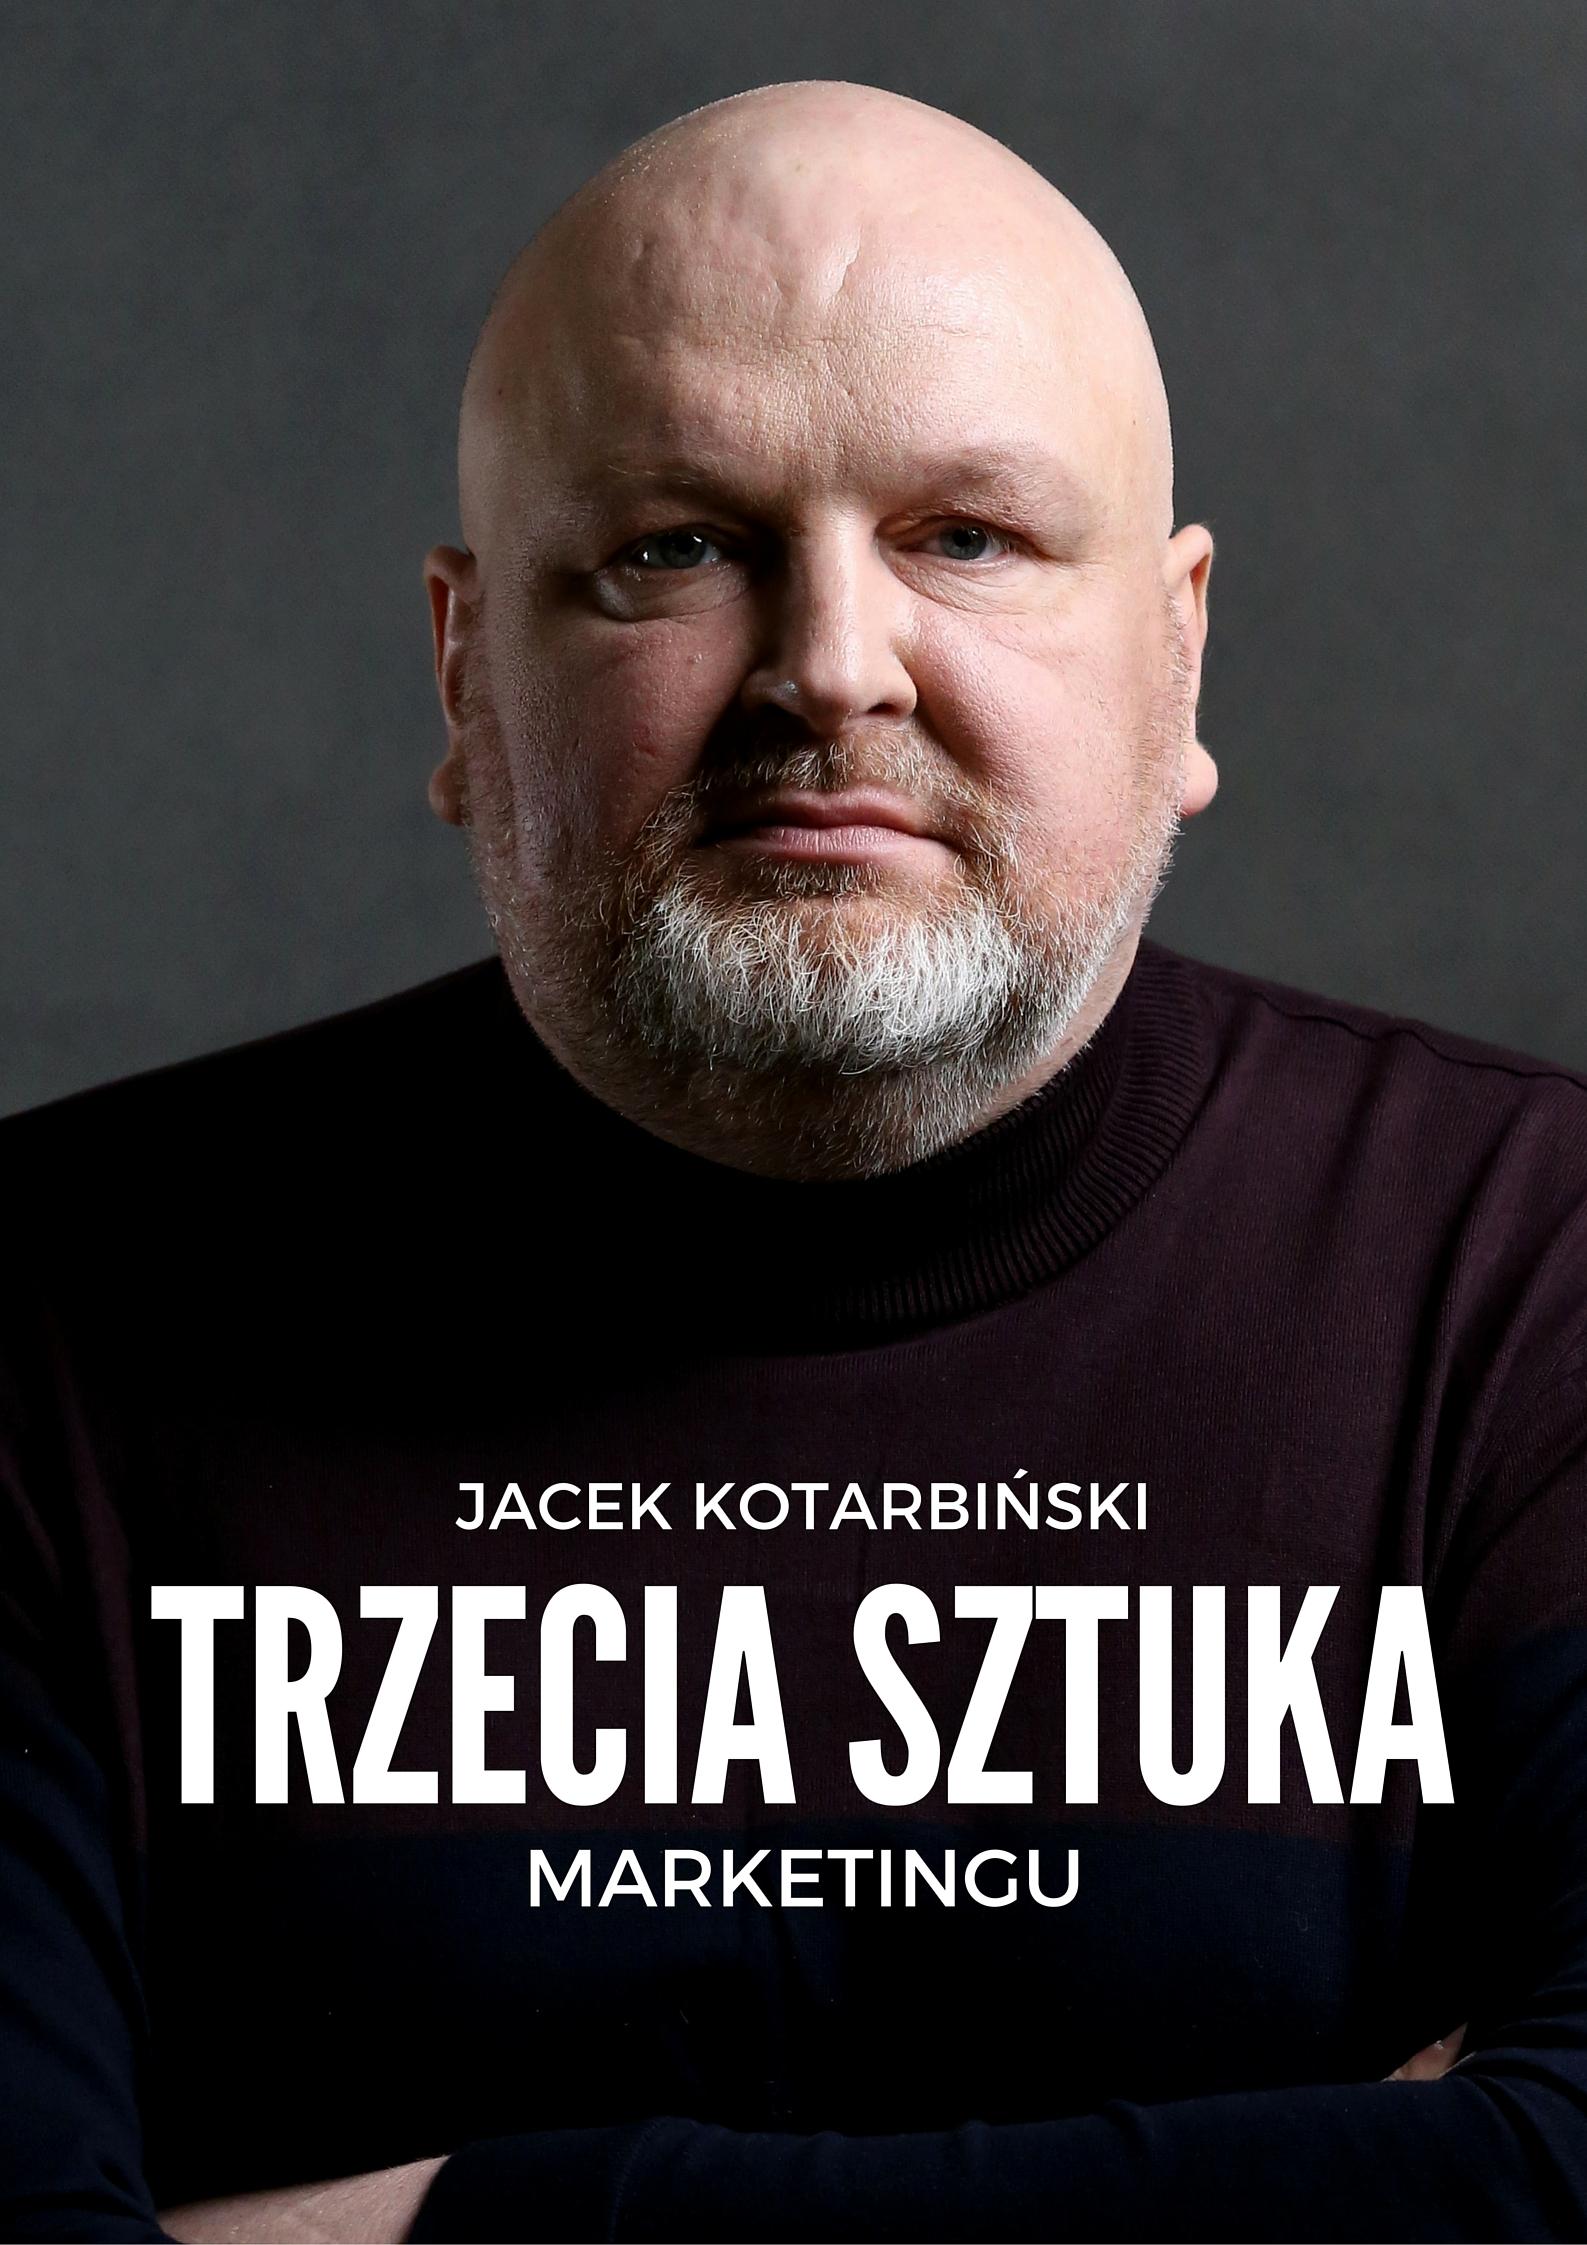 trzecia sztuka marketingu jacek kotarbinski